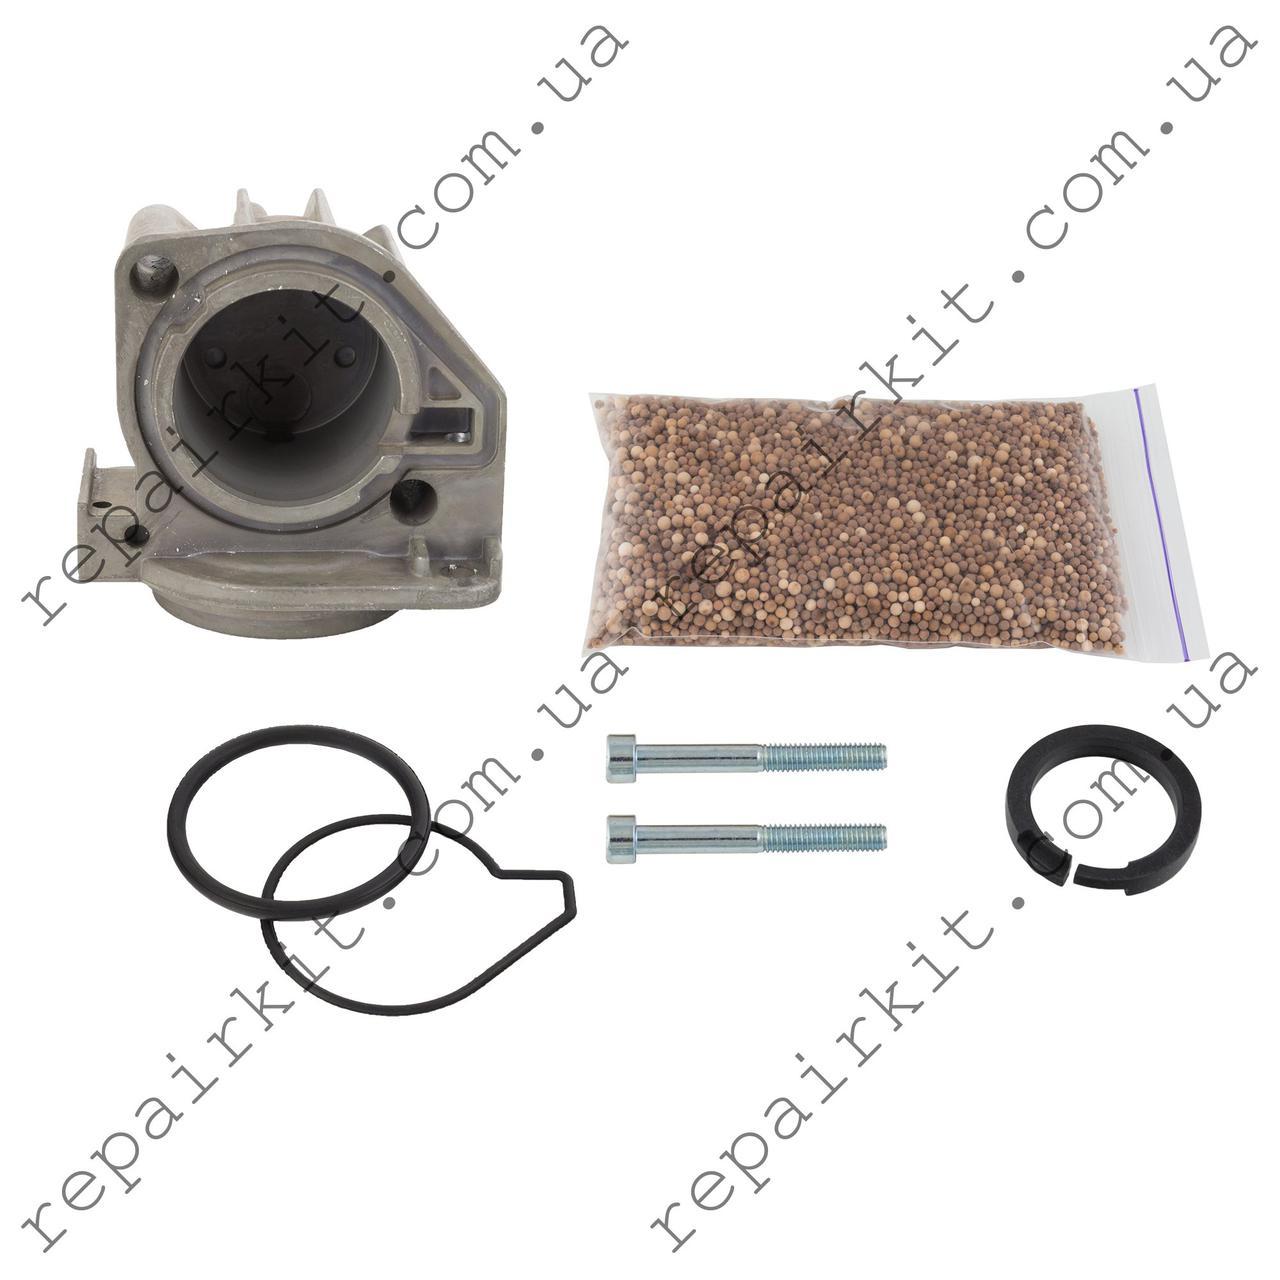 Ремкомплект компрессора пневмоподвески Wabco (тип 3), фото 1